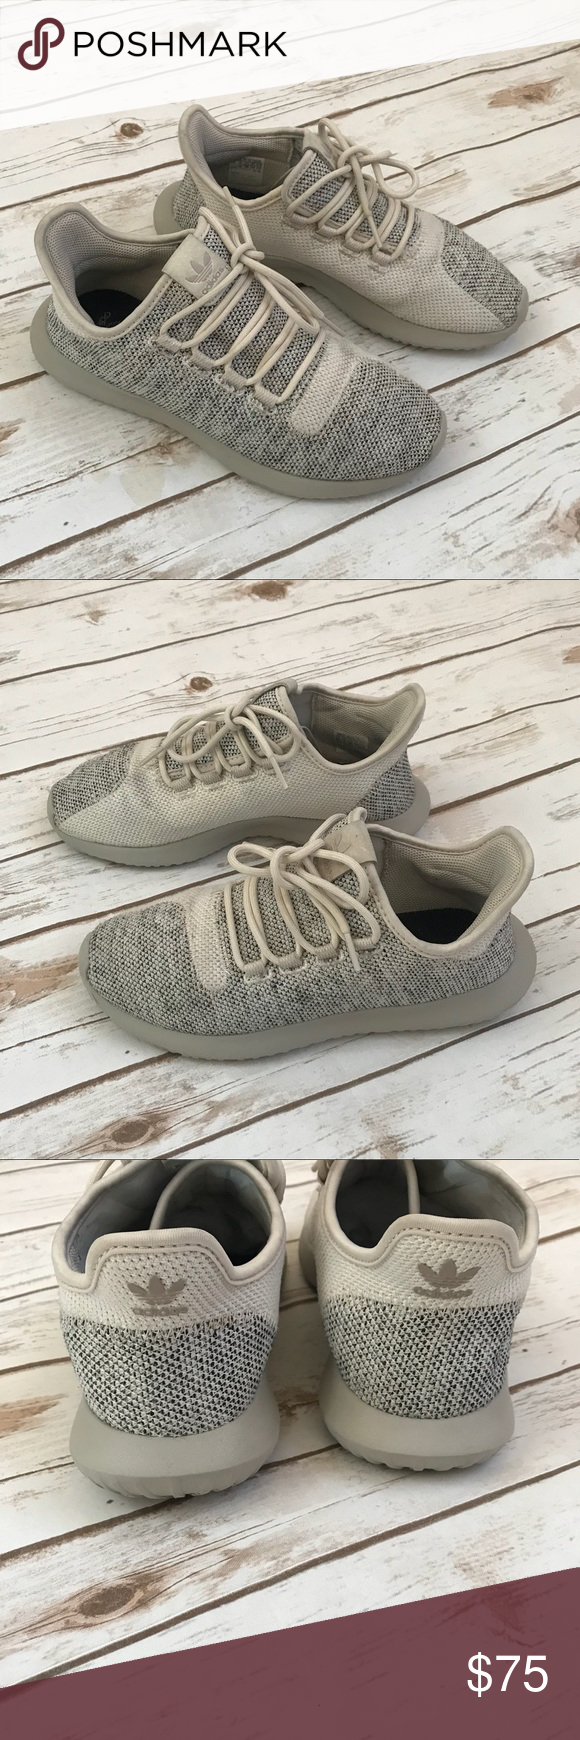 Adidas tubular tubular shadow shoes casual shoes 14906 | 176055e - allpoints.host